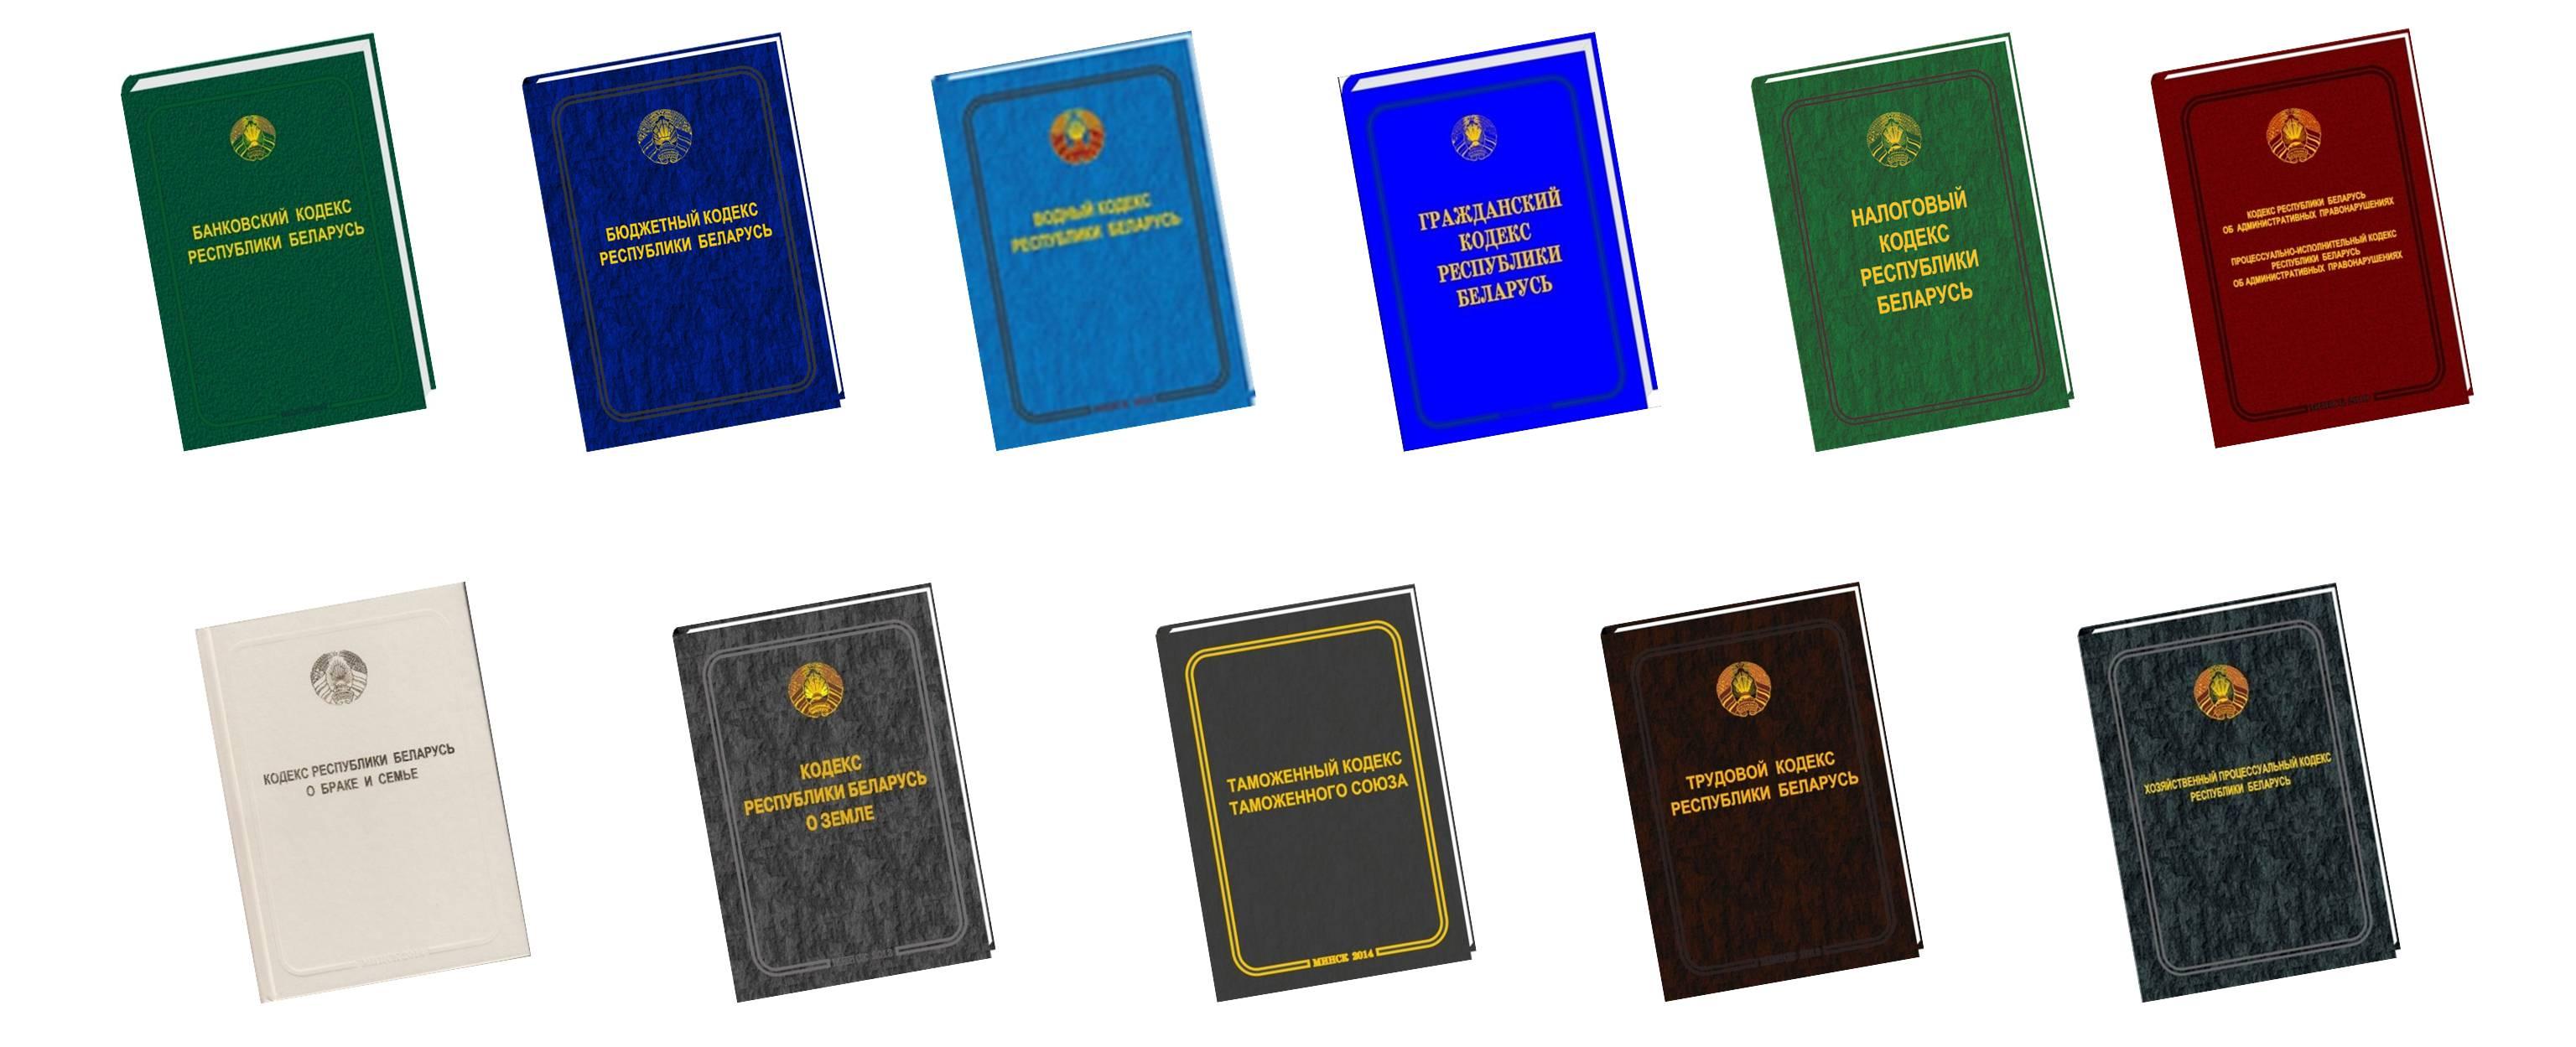 Кодексы Республики Беларусь 2019